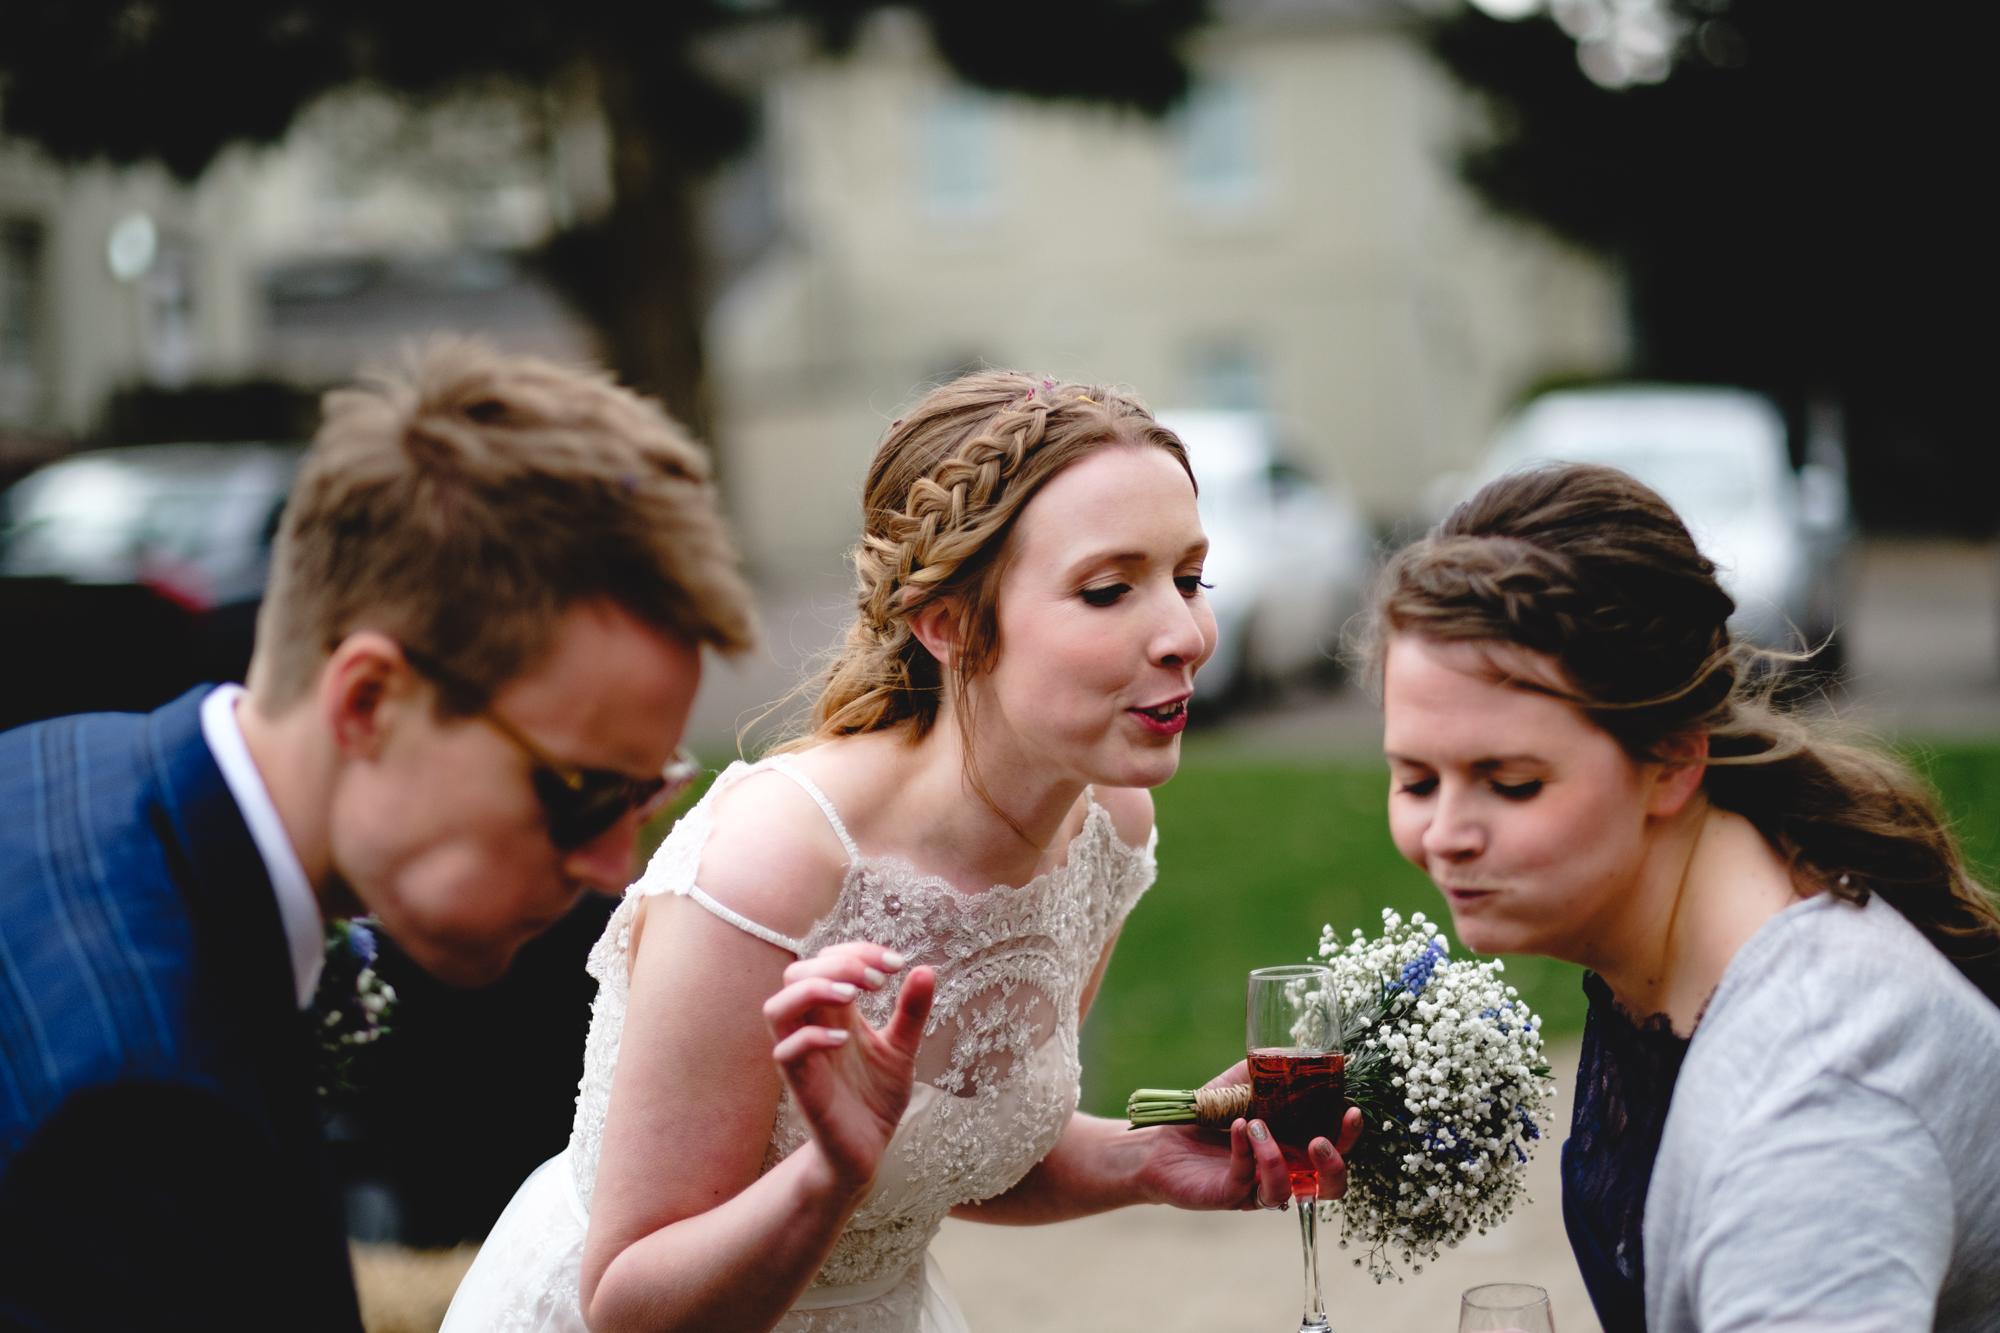 Katie and Dode weddings (112 of 207).jpg